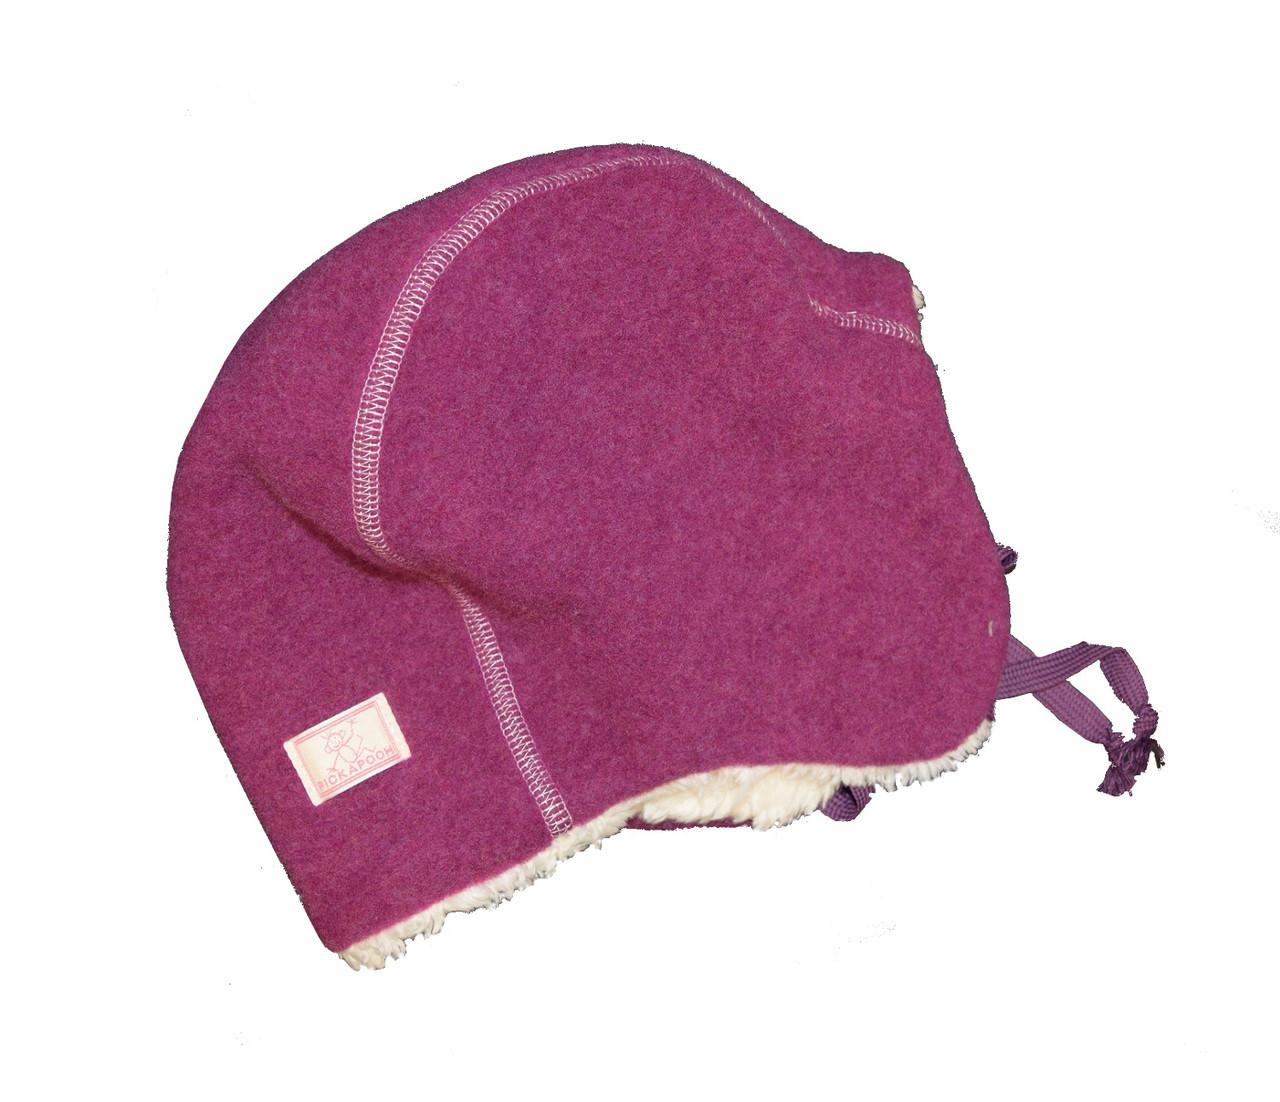 6ac4f0da3f2 Organic Wool Fleece Winter Hat